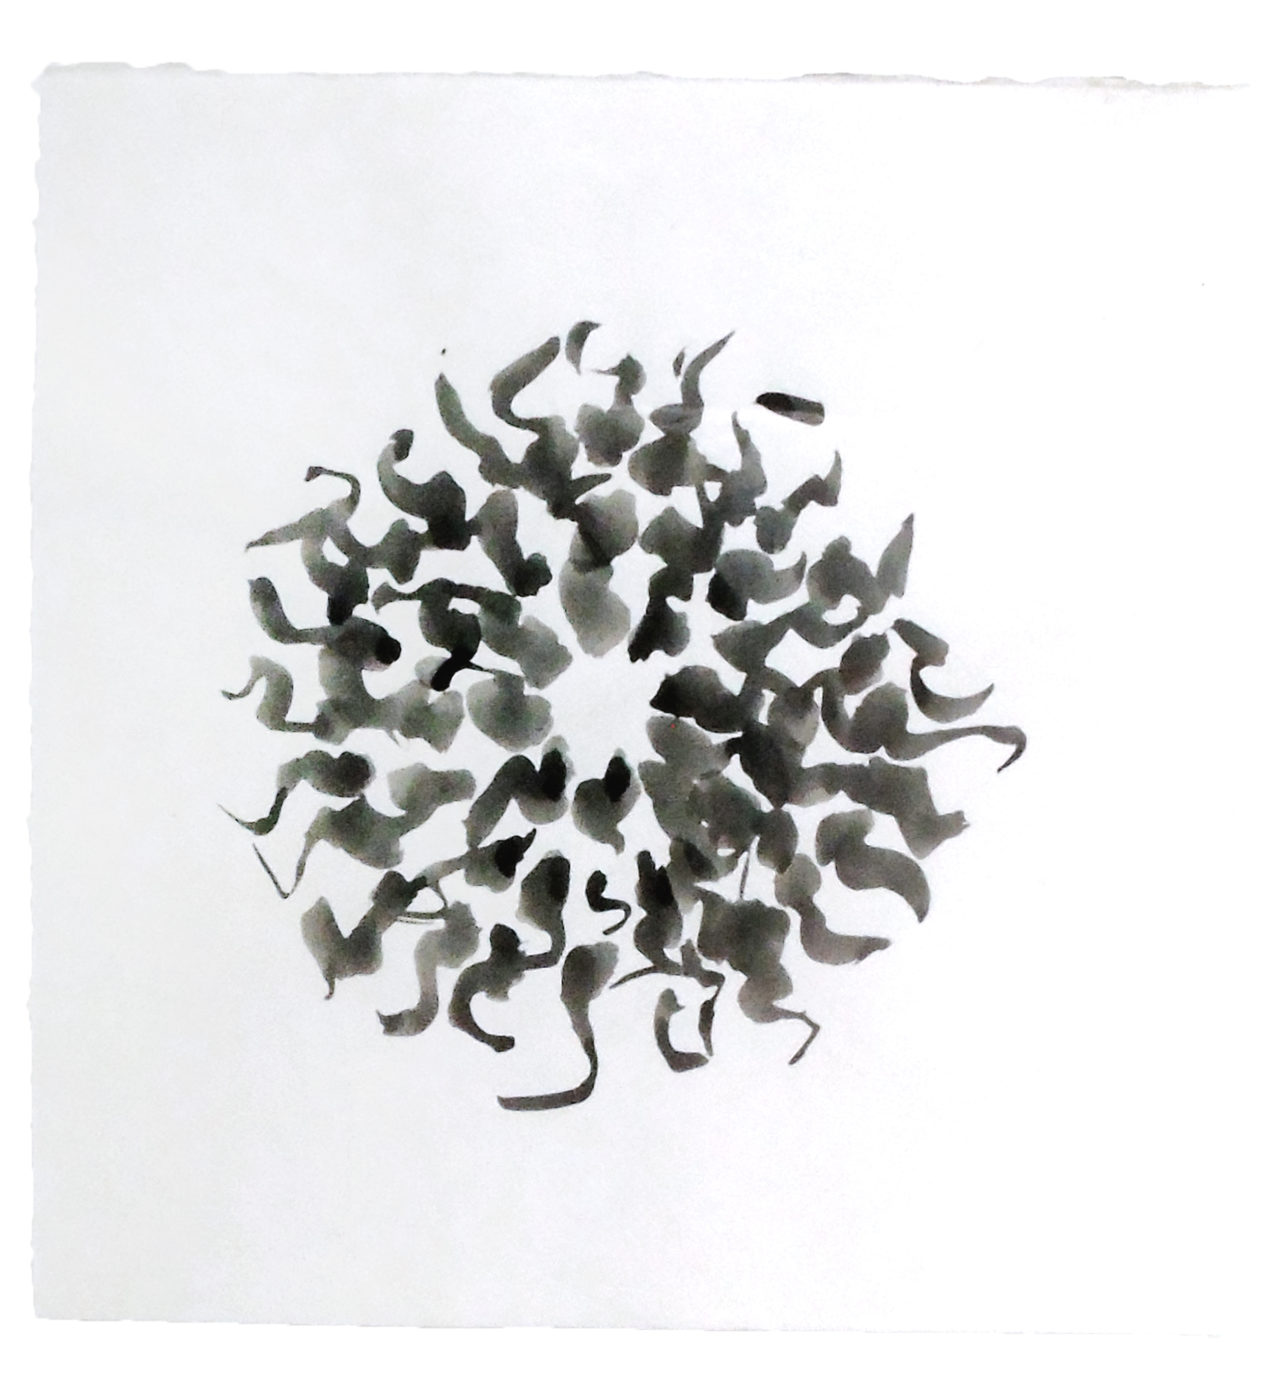 Adolfo Schlosser, Sin título, 2002 Galería Elvira González